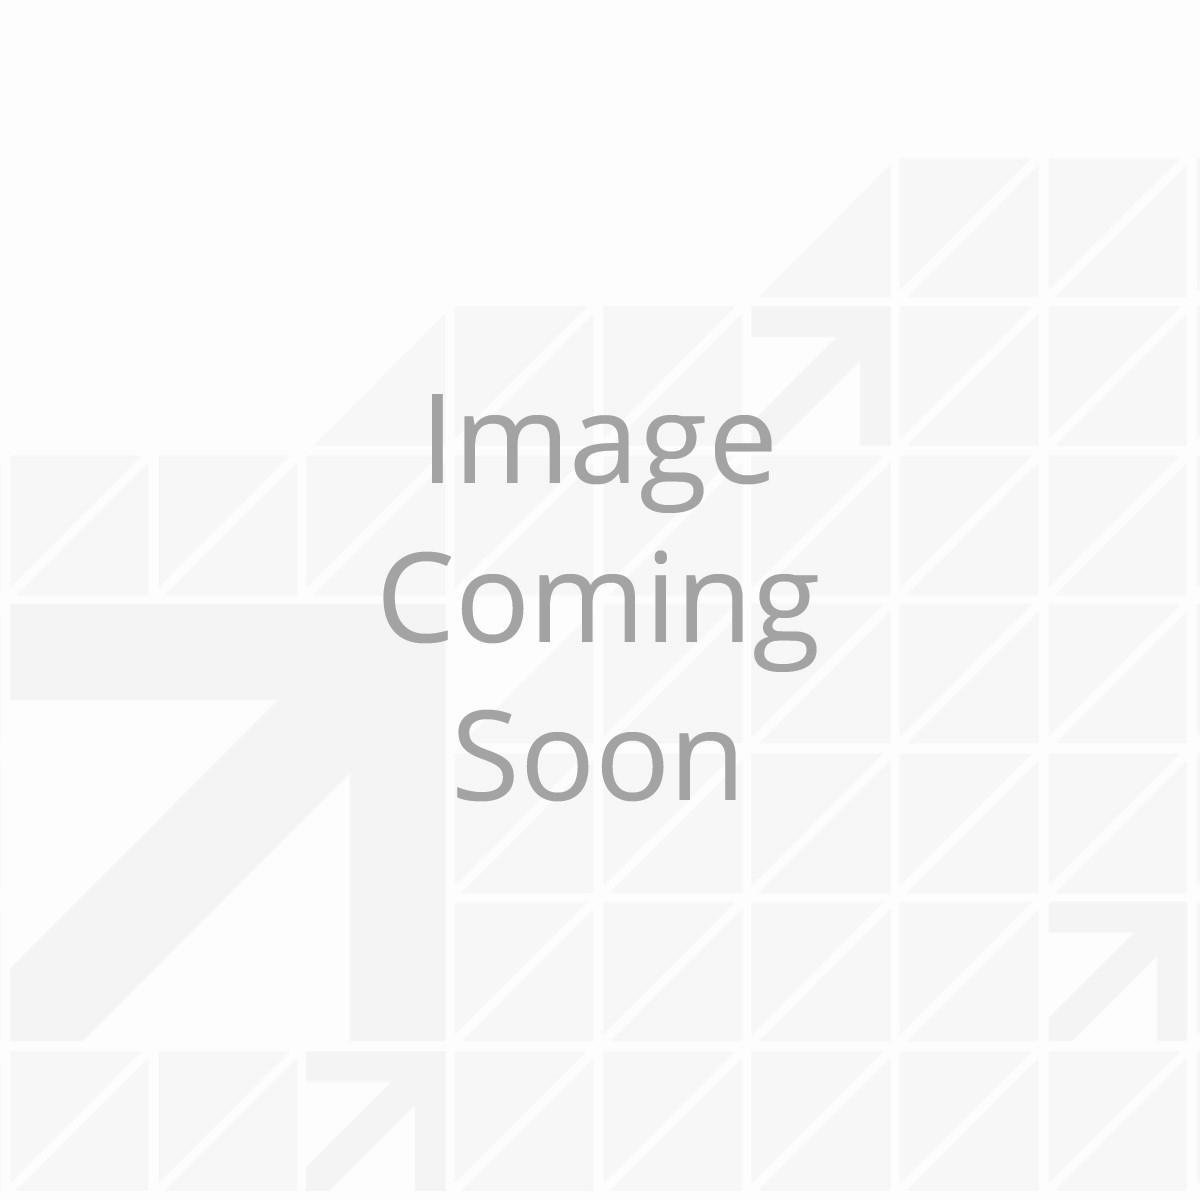 1021 Low VOC Self-Leveling Lap Sealant, Beige (10.3 Oz. Tube)